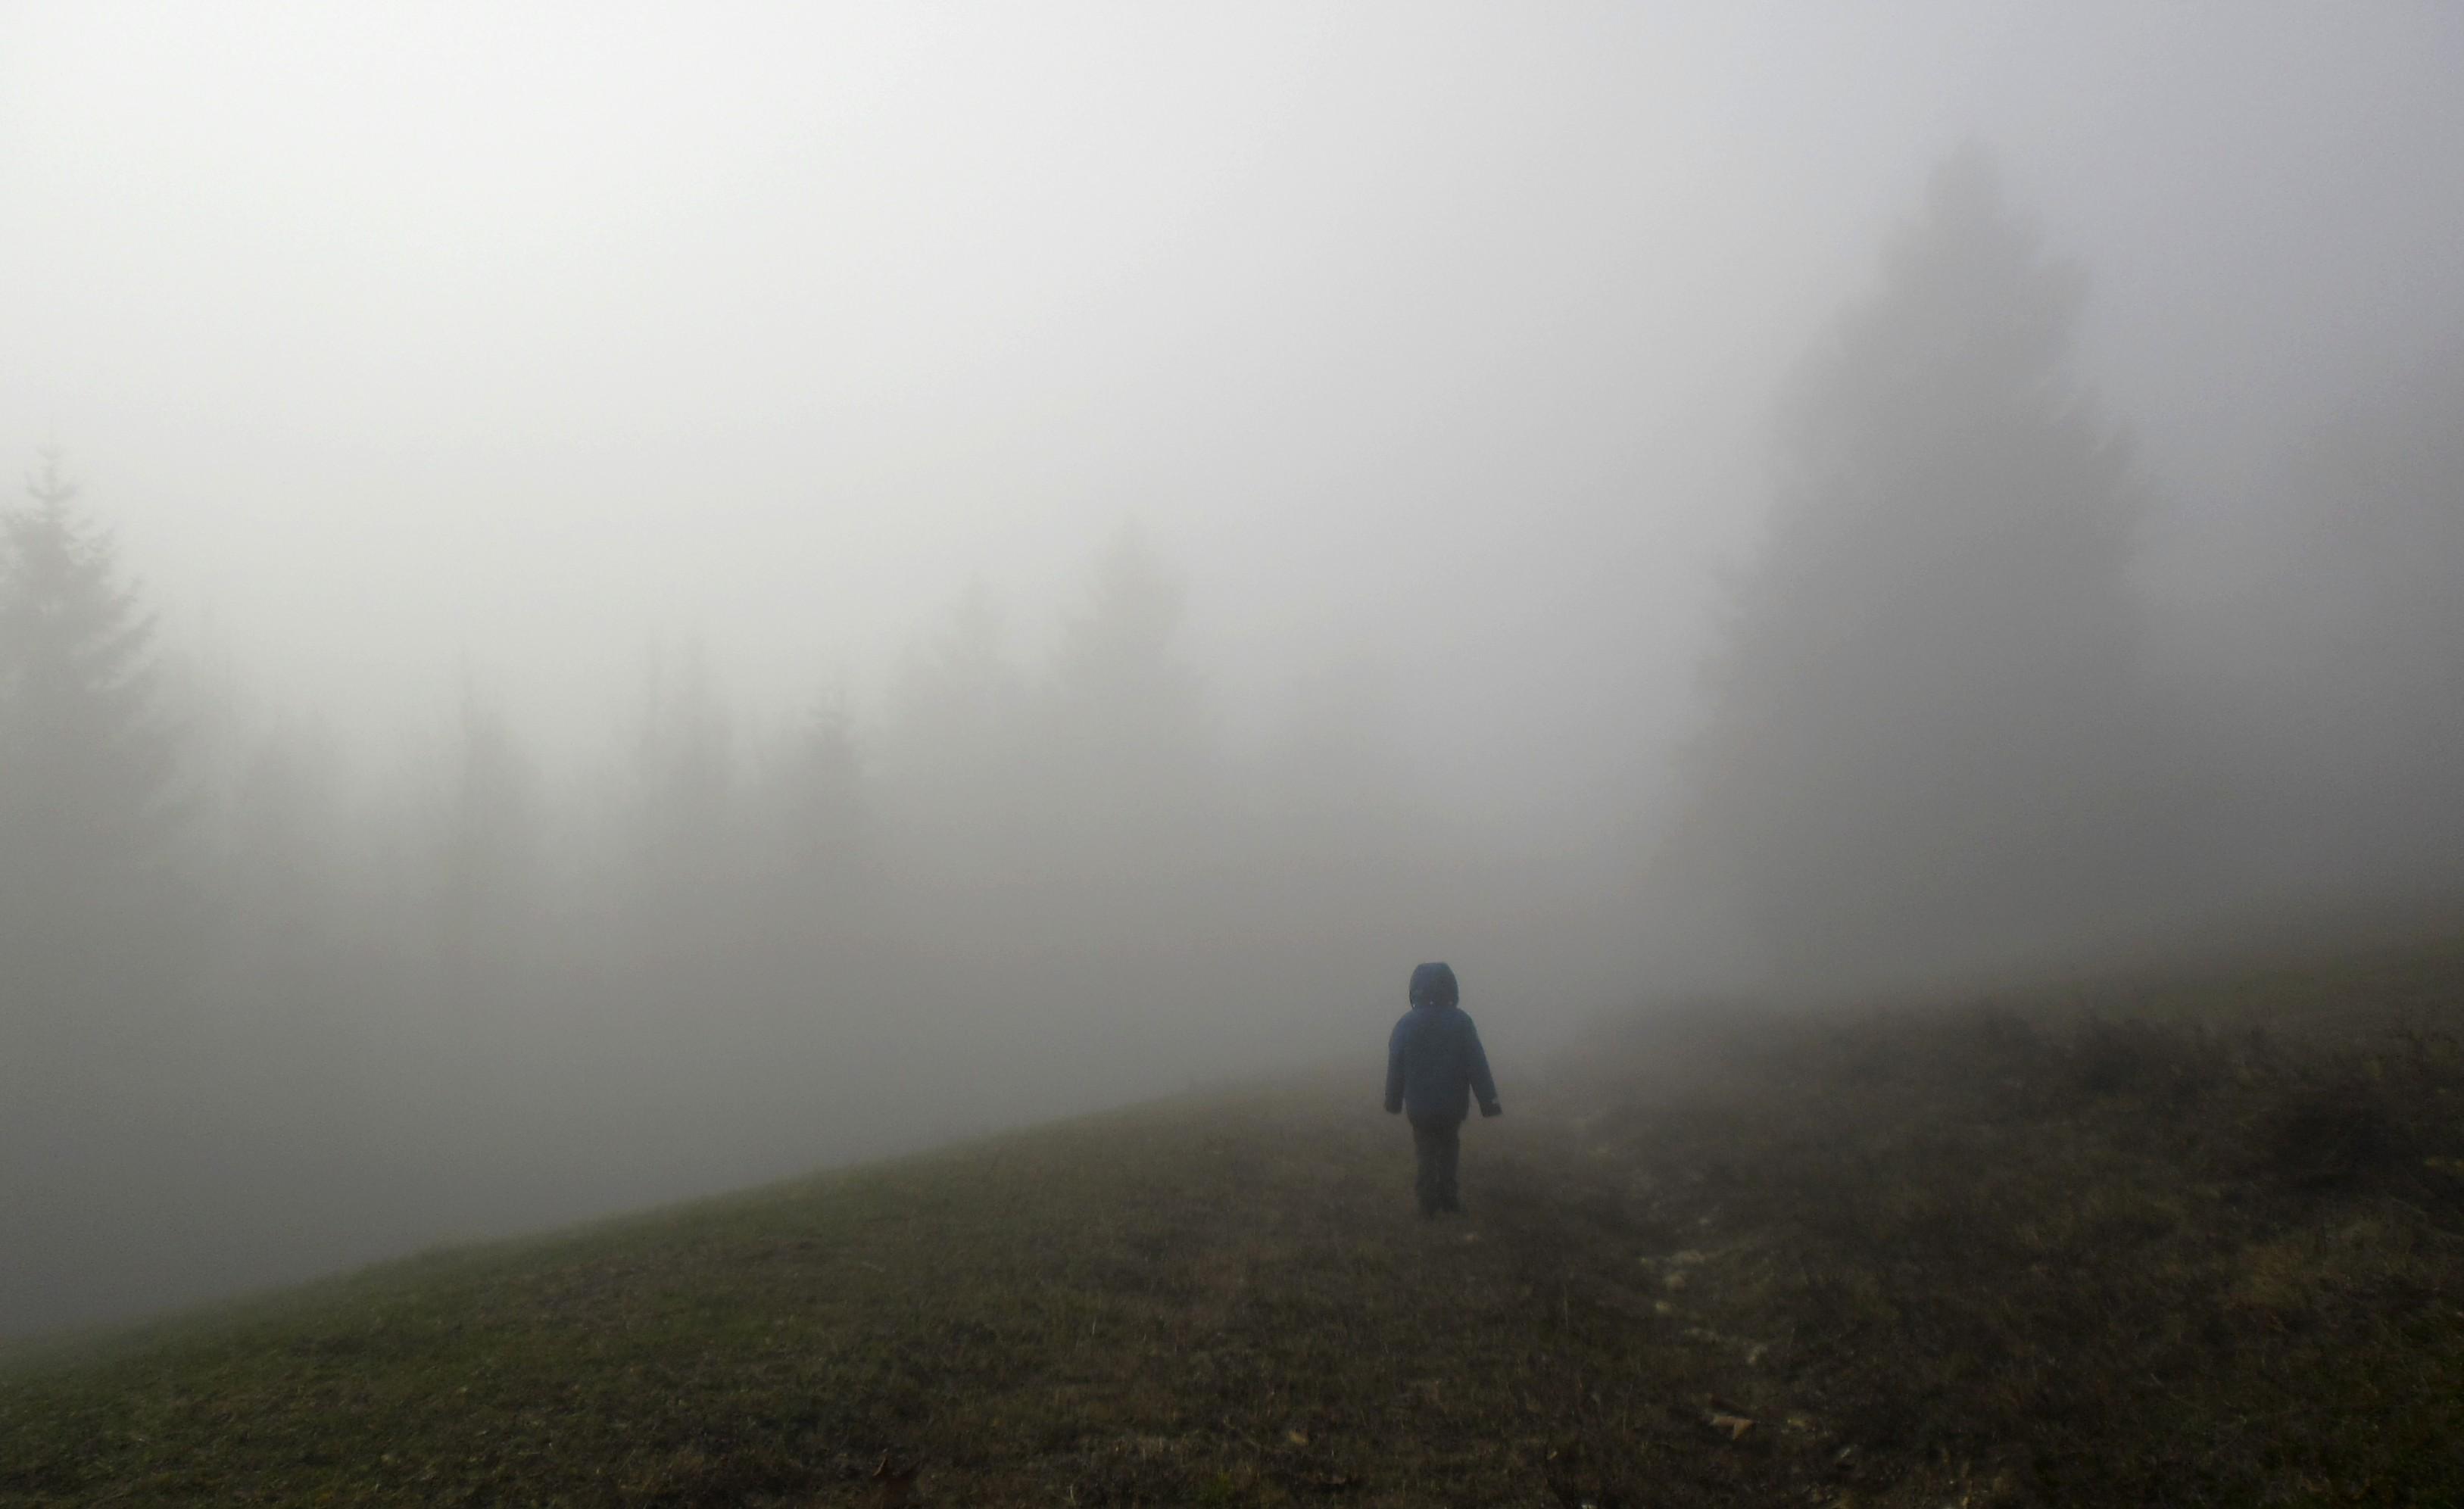 Into The Mist Wallpaper - WallpaperSafari